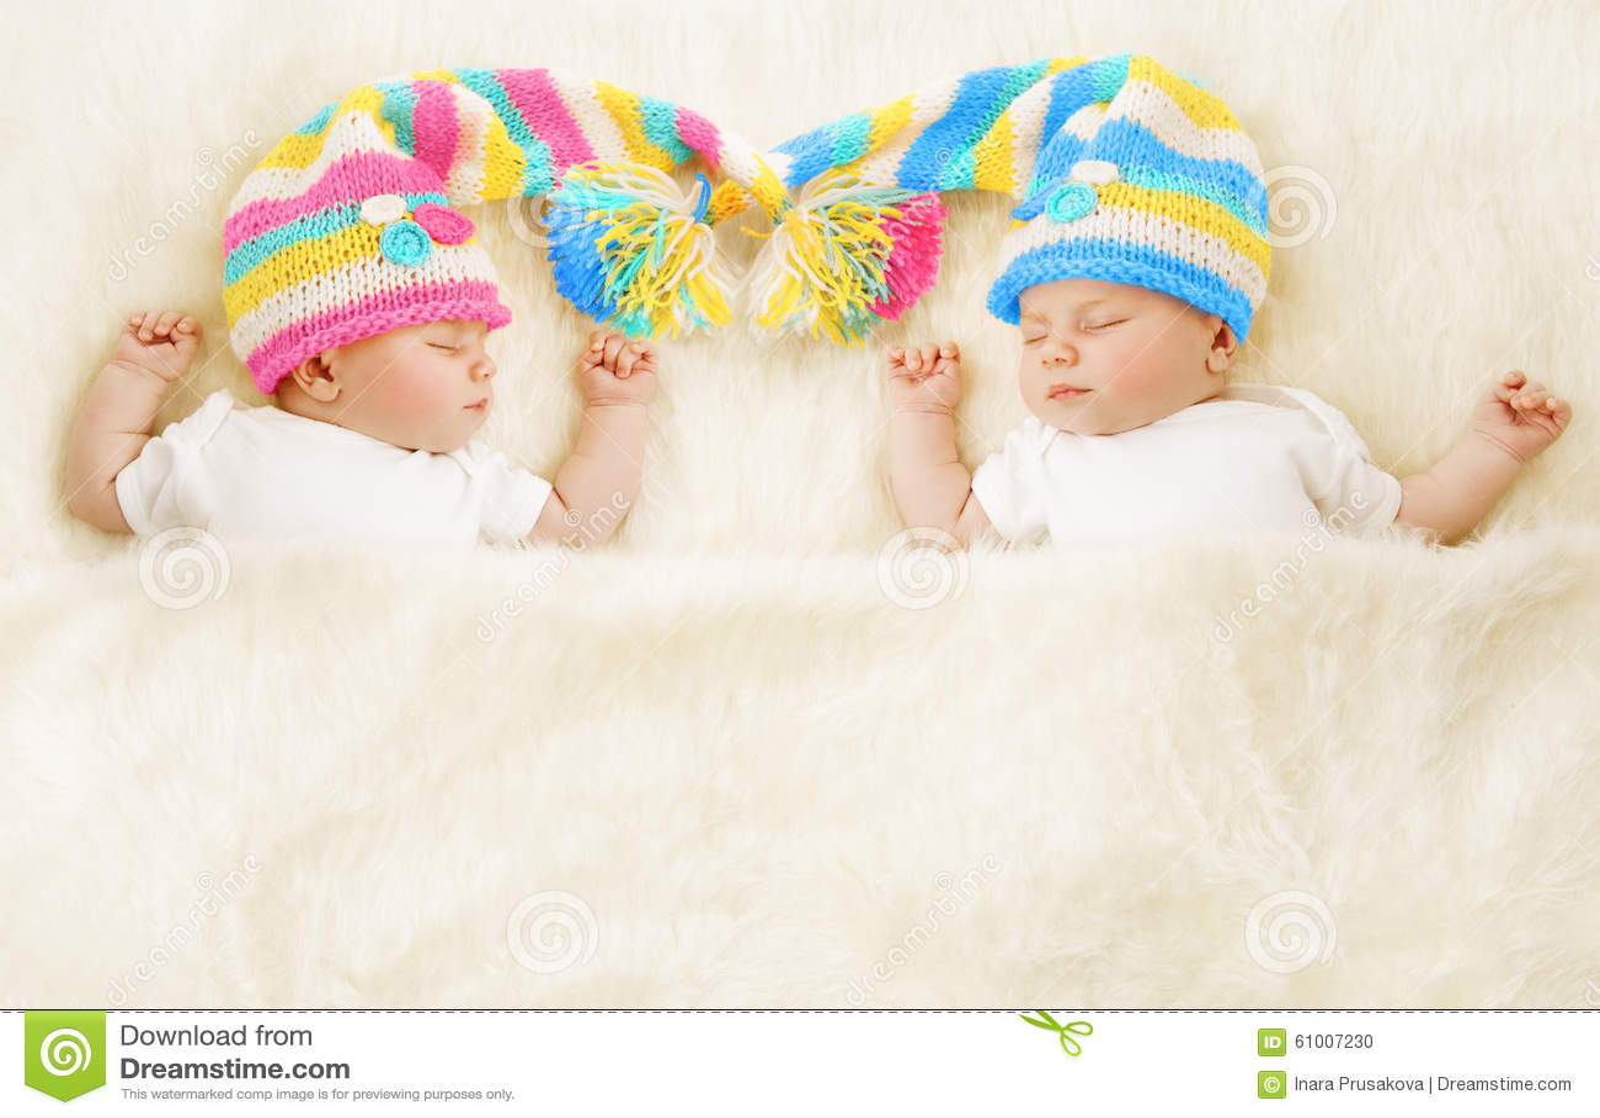 Twins Babies Sleep Hat, Newborn Kids Sleeping, Cute New ...